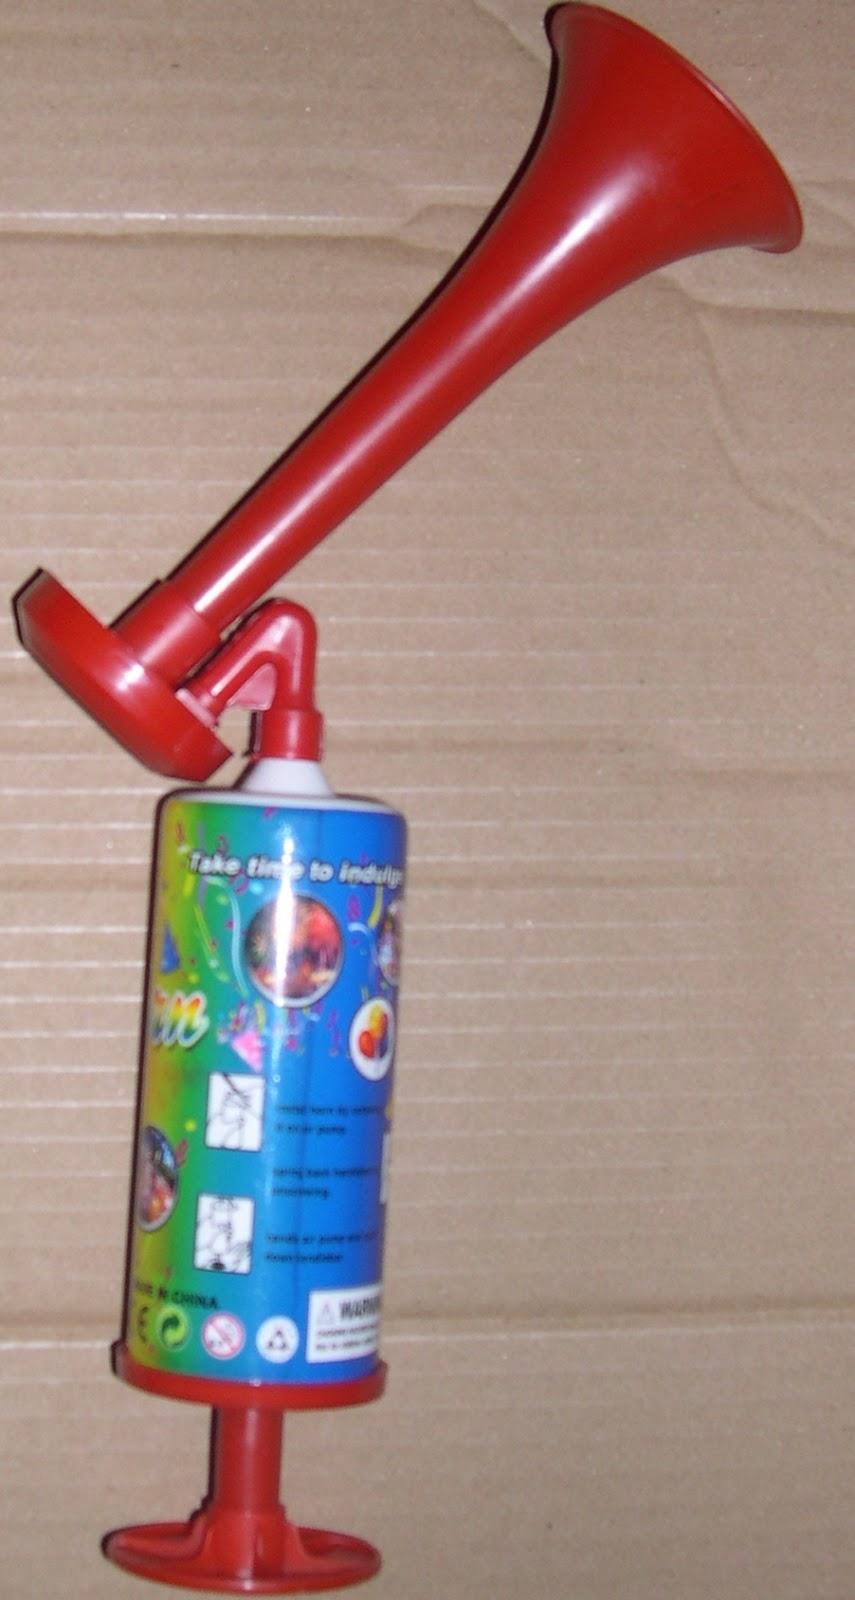 Terompet Tahun Baru Murah Harga Grosir Digitoys Mainan Pompa Impor